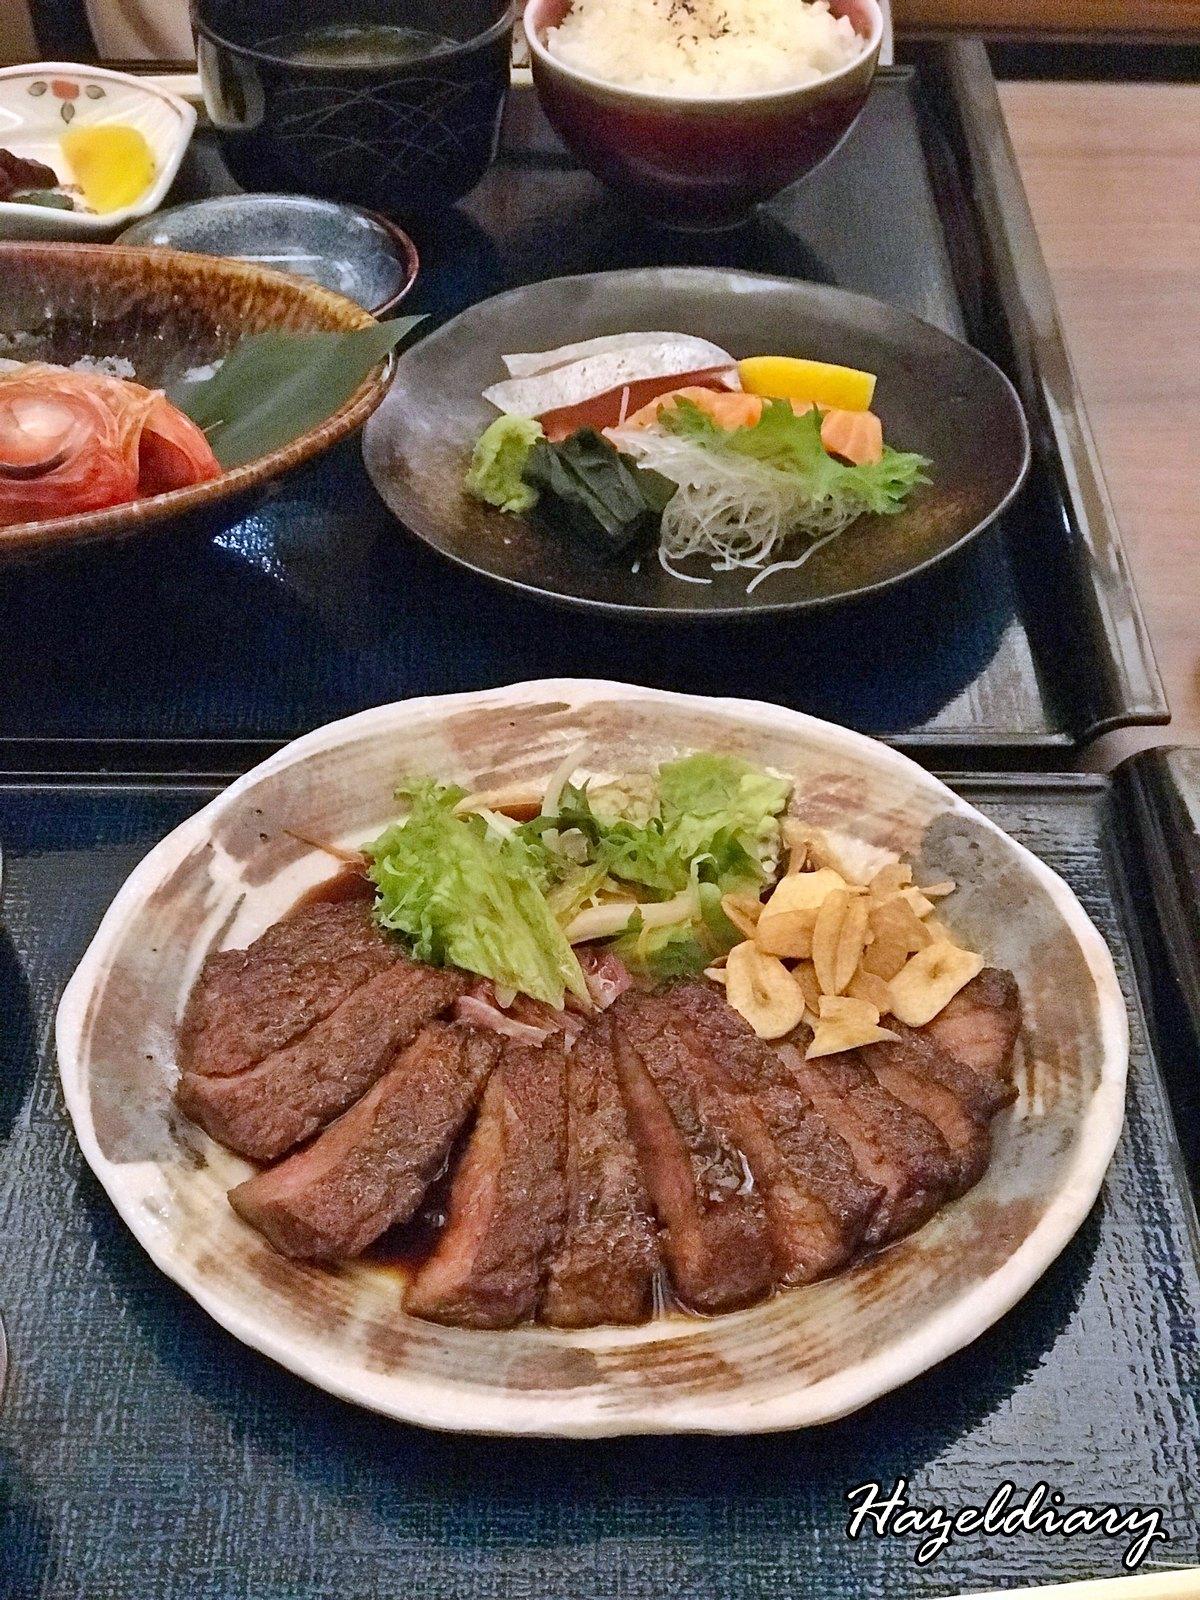 Mitsu Spring Menu-Wagyu Beef Steak